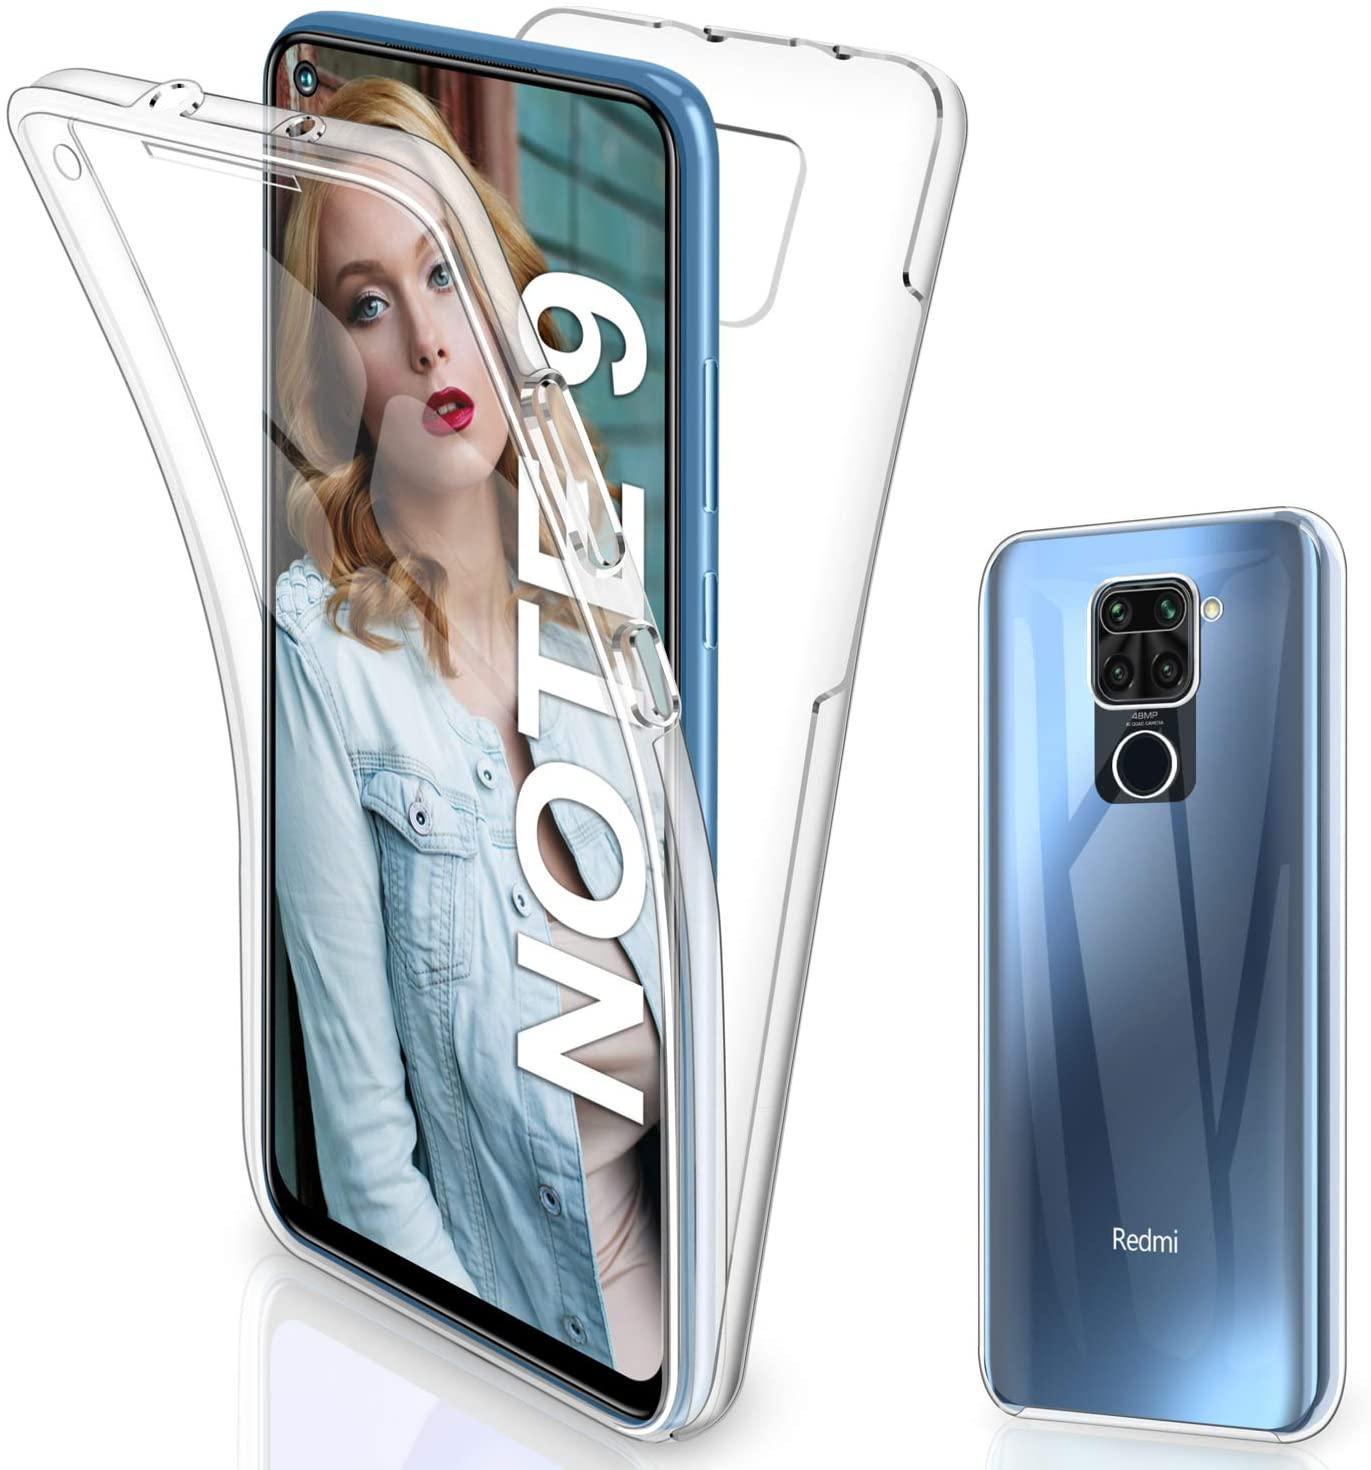 Coque Integrale Silicone Pour Xiaomi Redmi Note 9S / 9Pro Protection 360 Little Boutik®